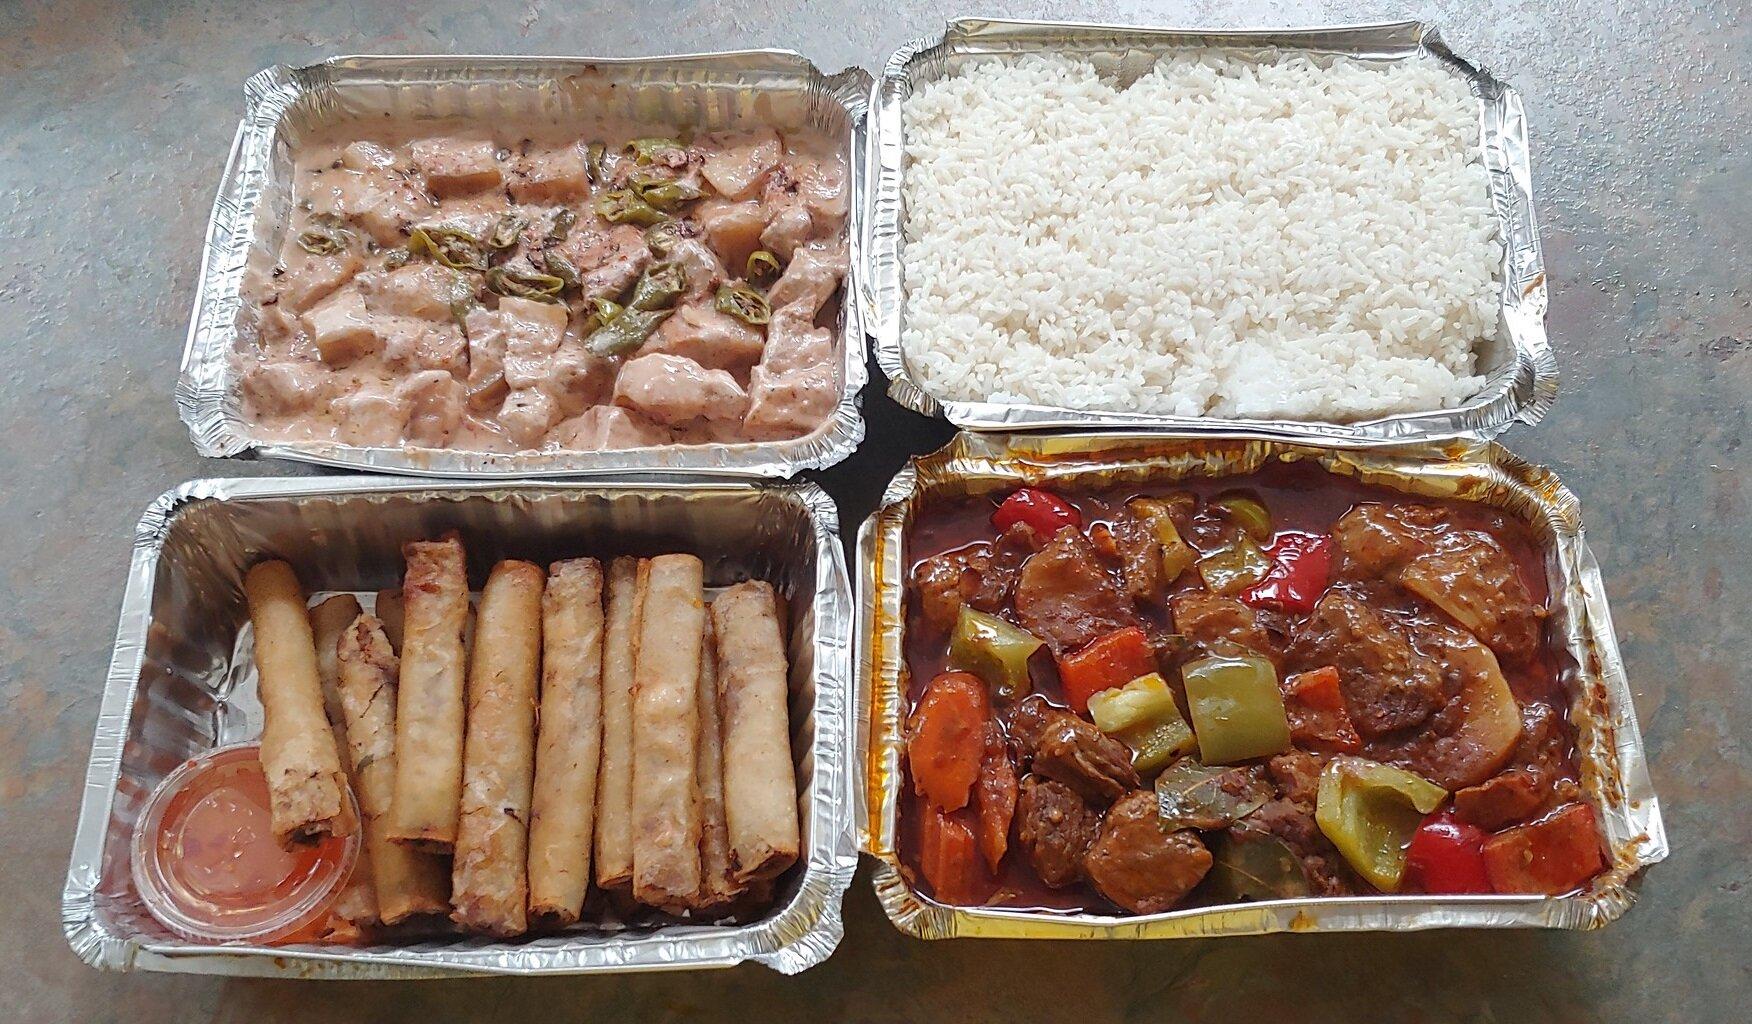 Bricol express, rice, lumpia, and calederata // Christopher Bragg